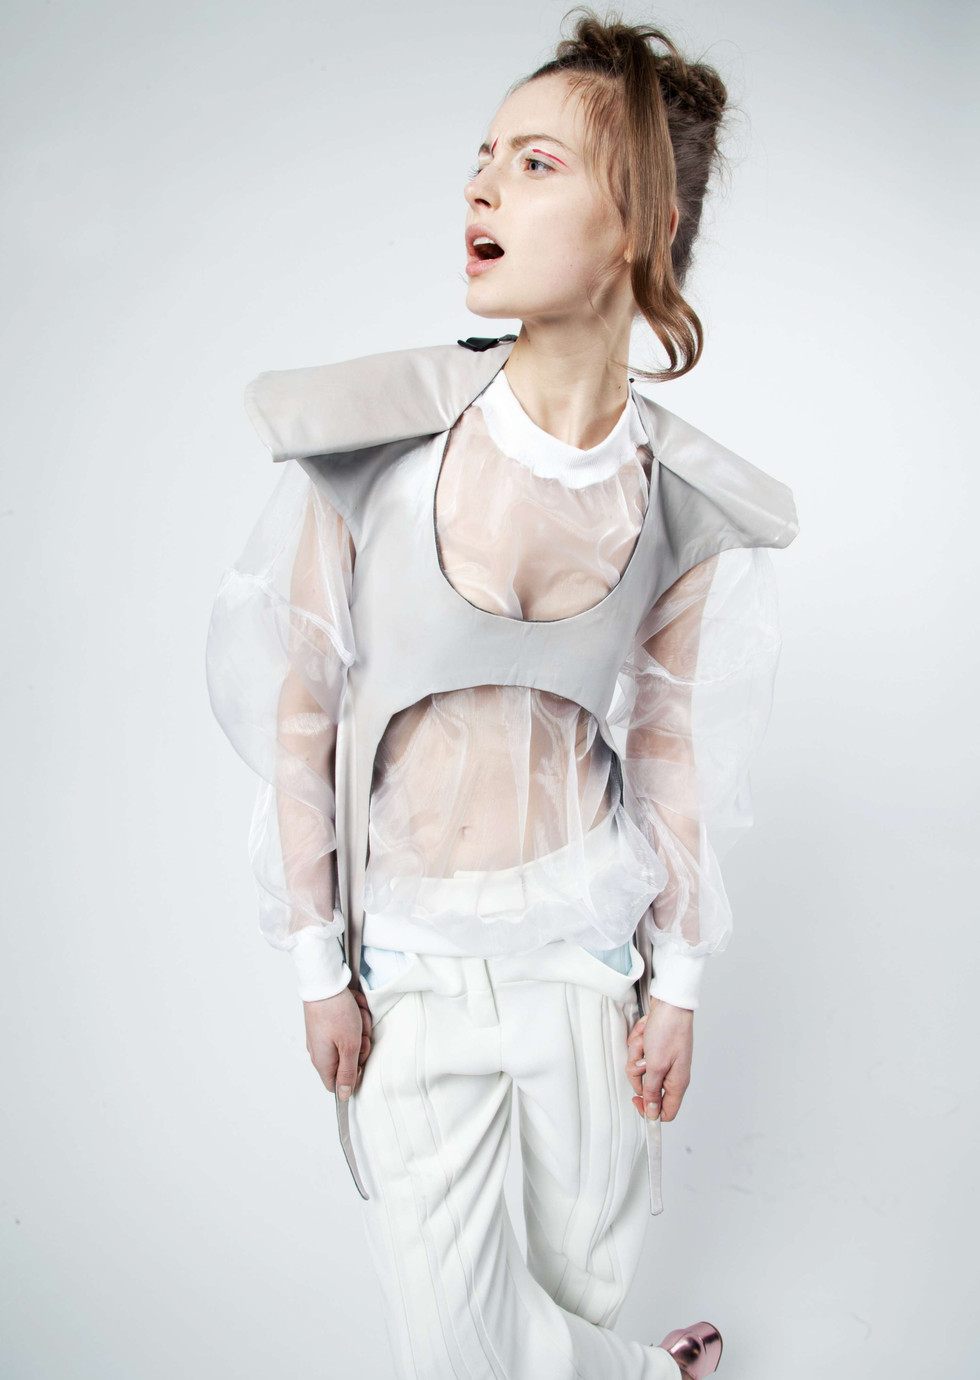 Material Girl Magazine-Reaching out by Anastasia Rasschupkina